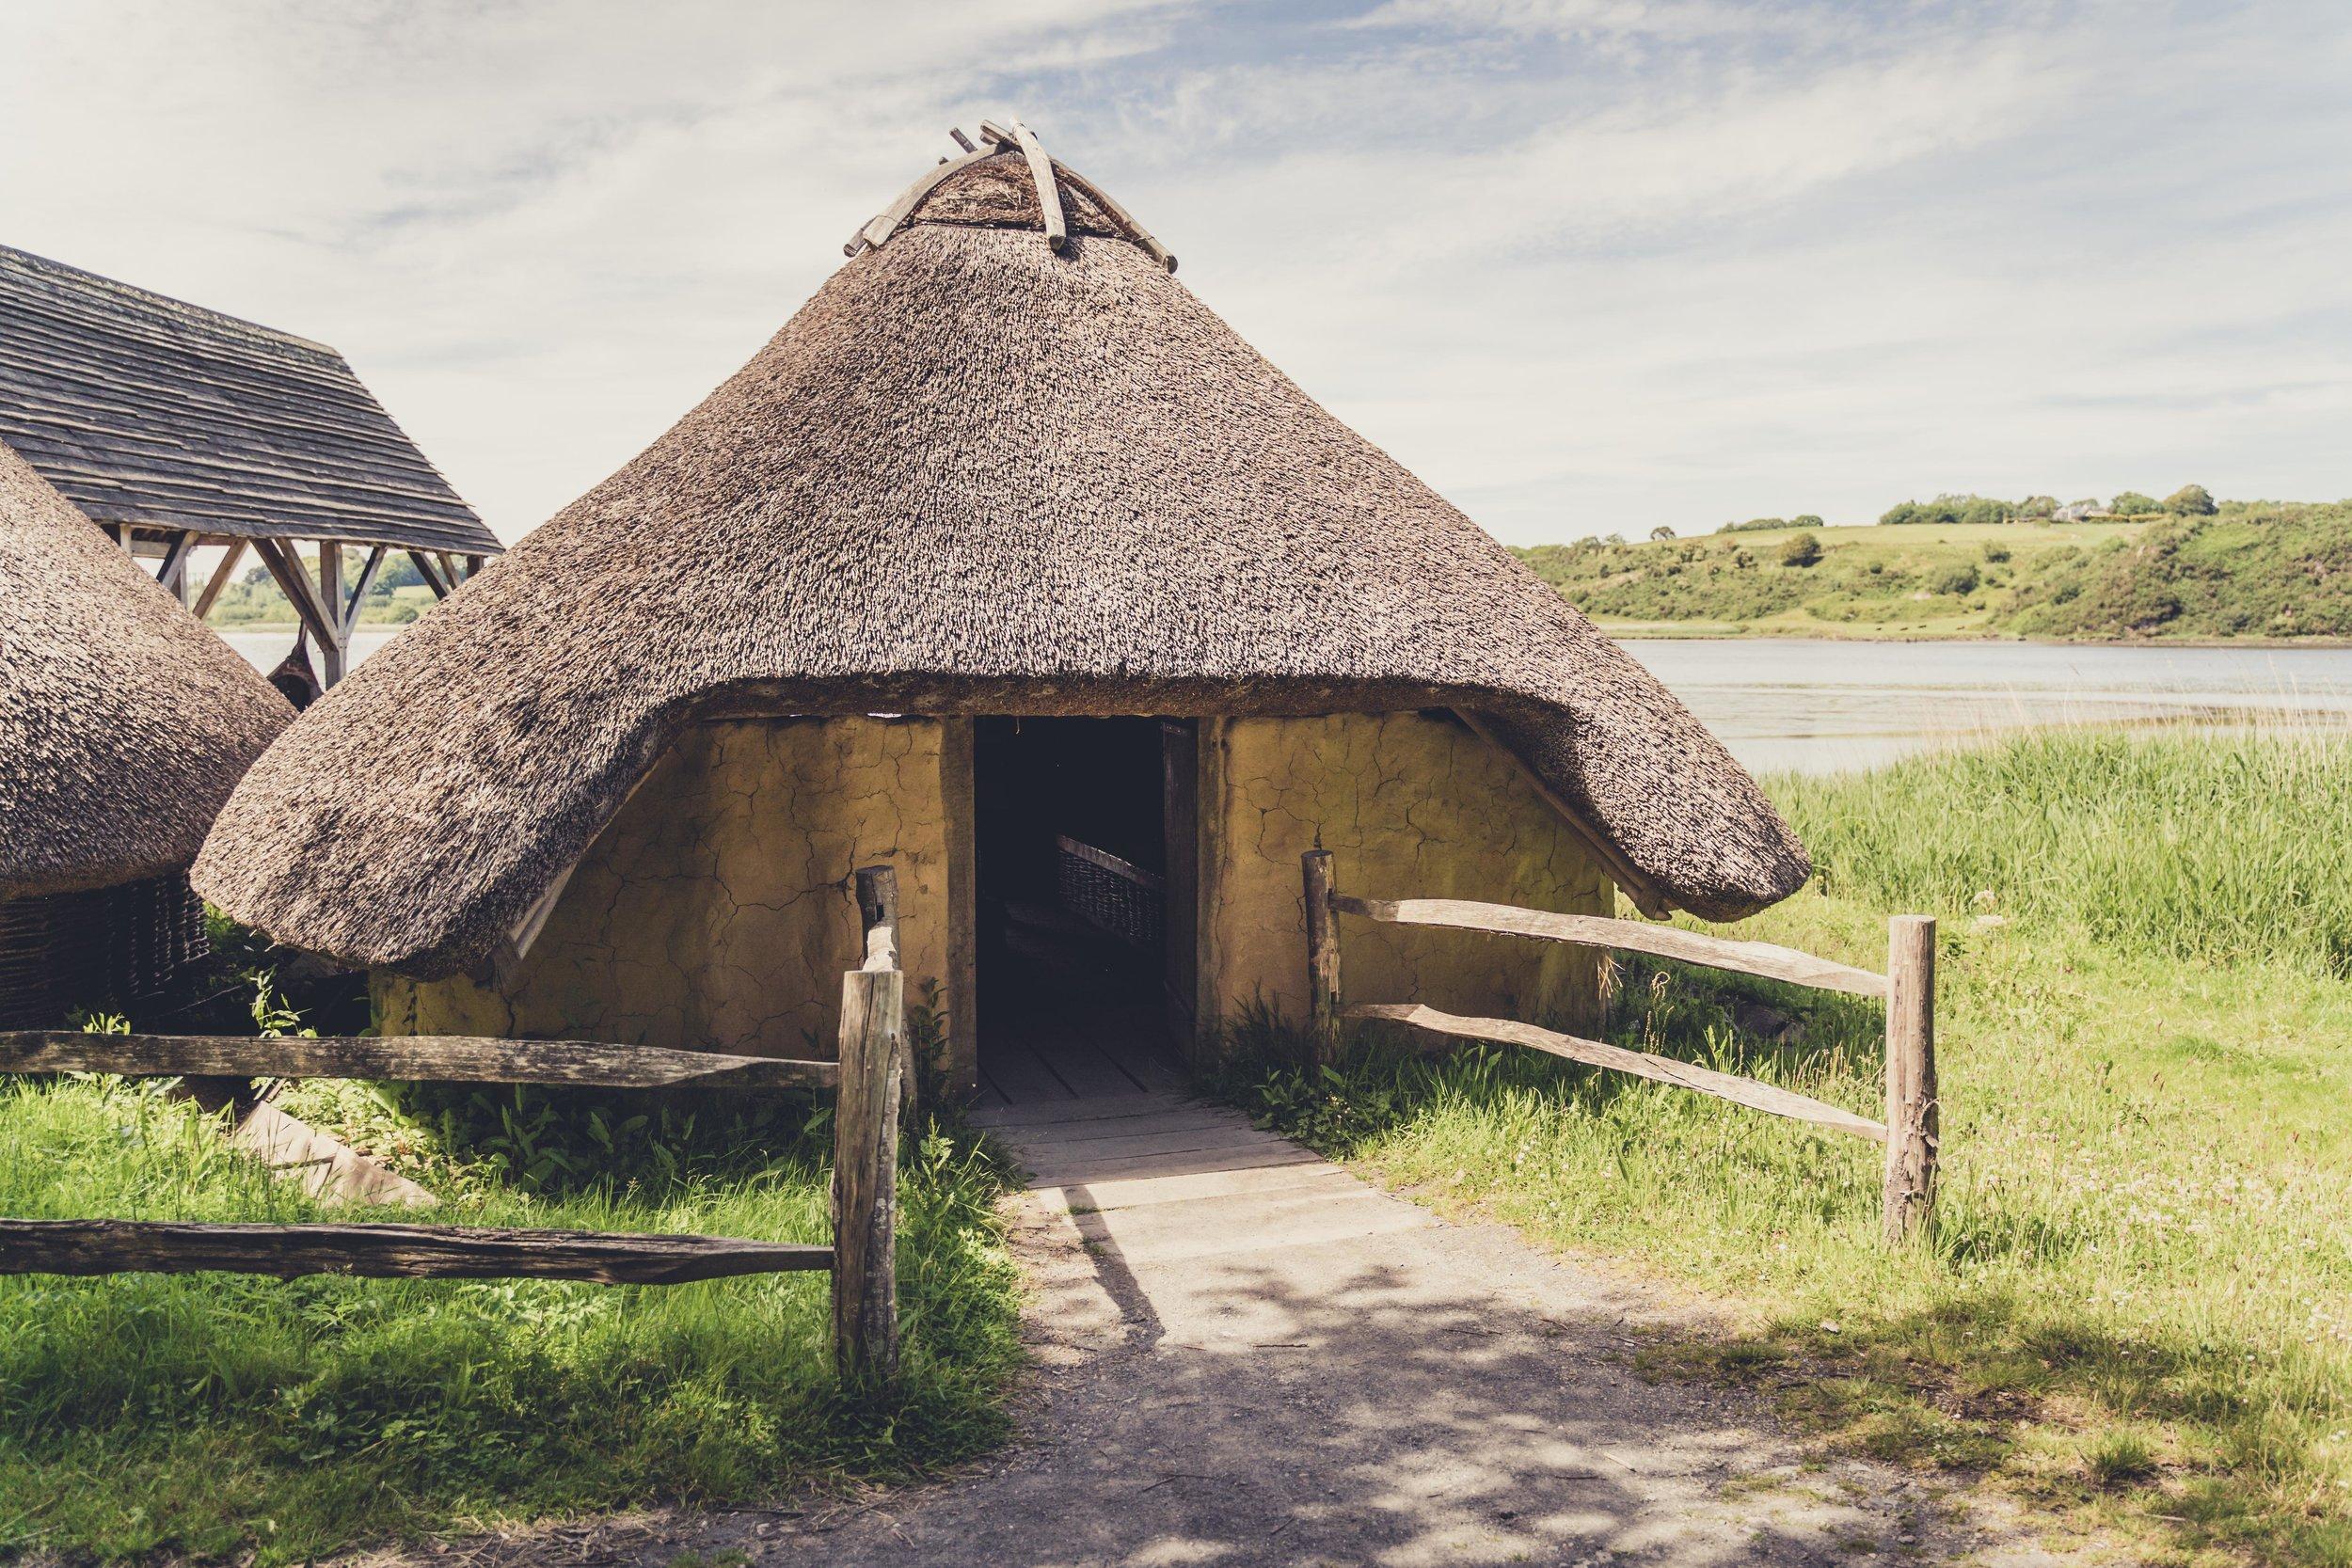 wexford heritage centre ireland viking house.jpg